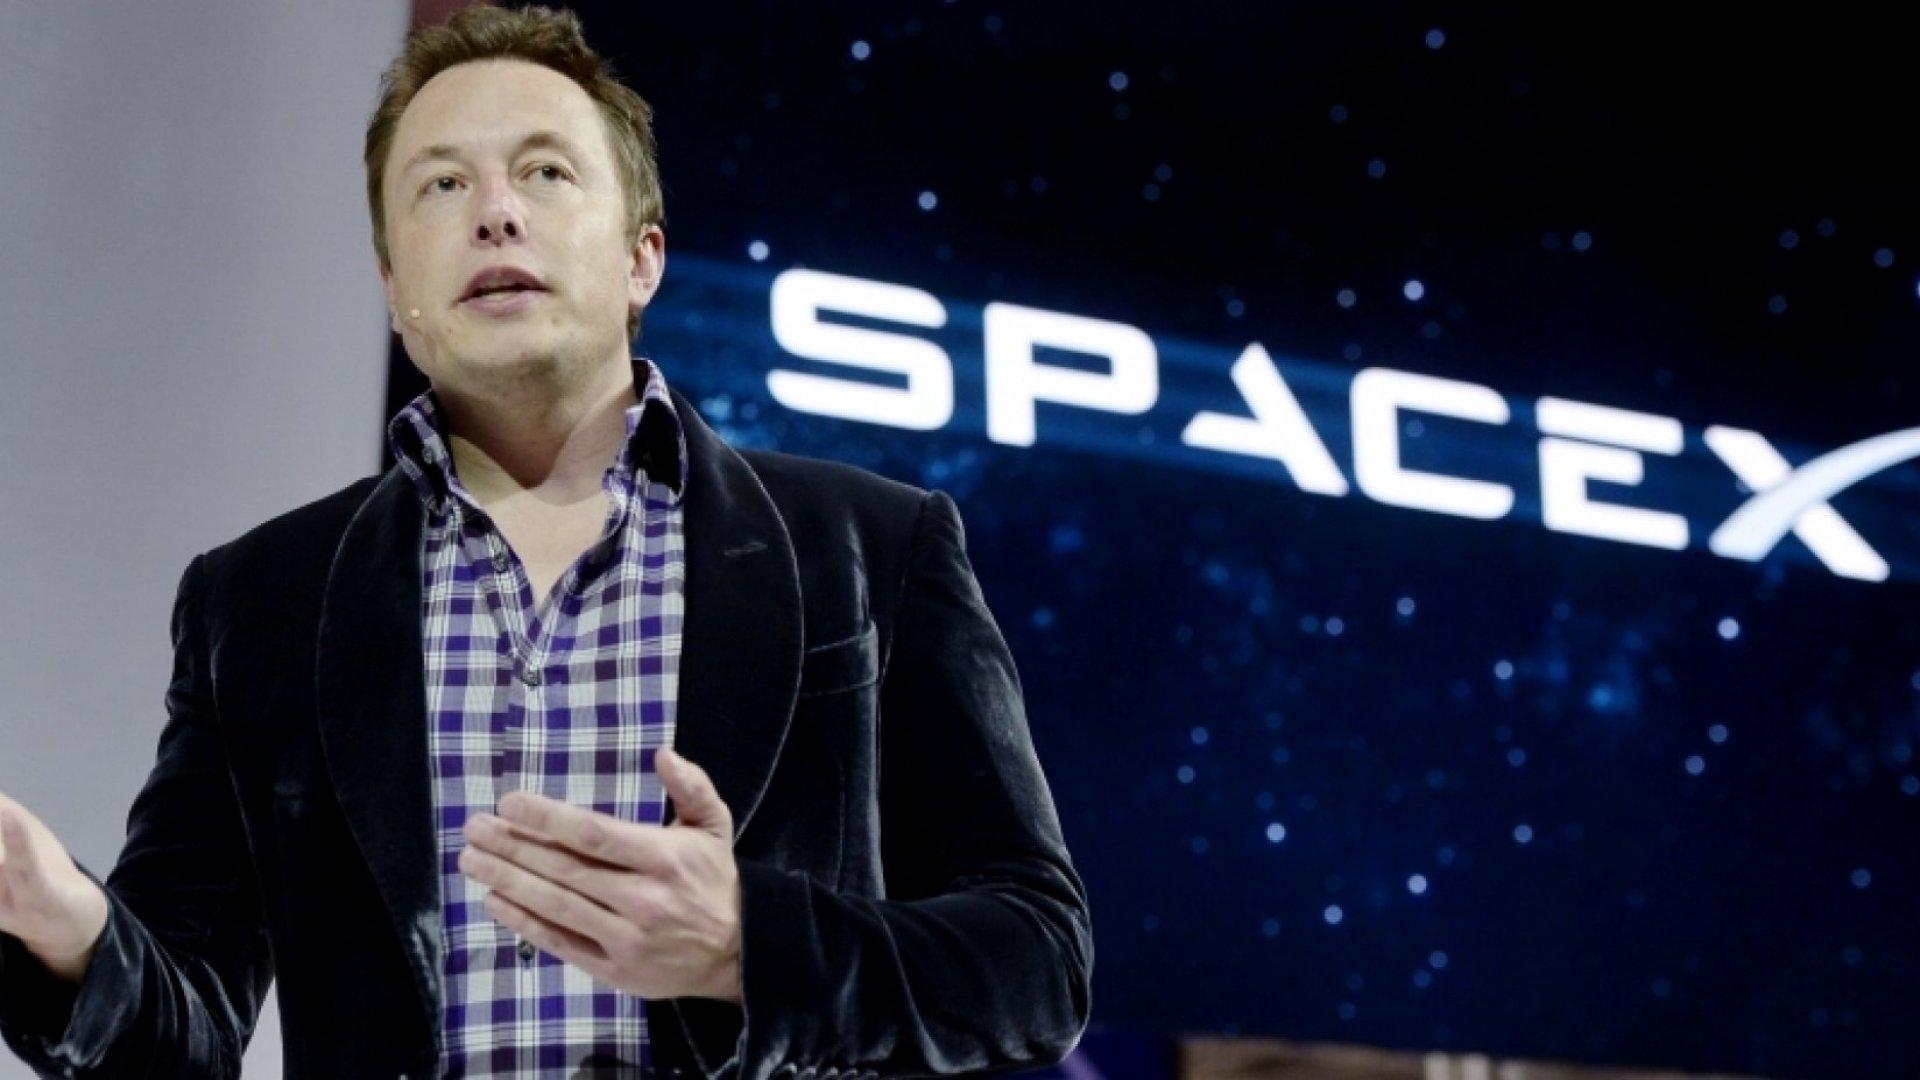 7 Reasons Why Elon Musk Matters